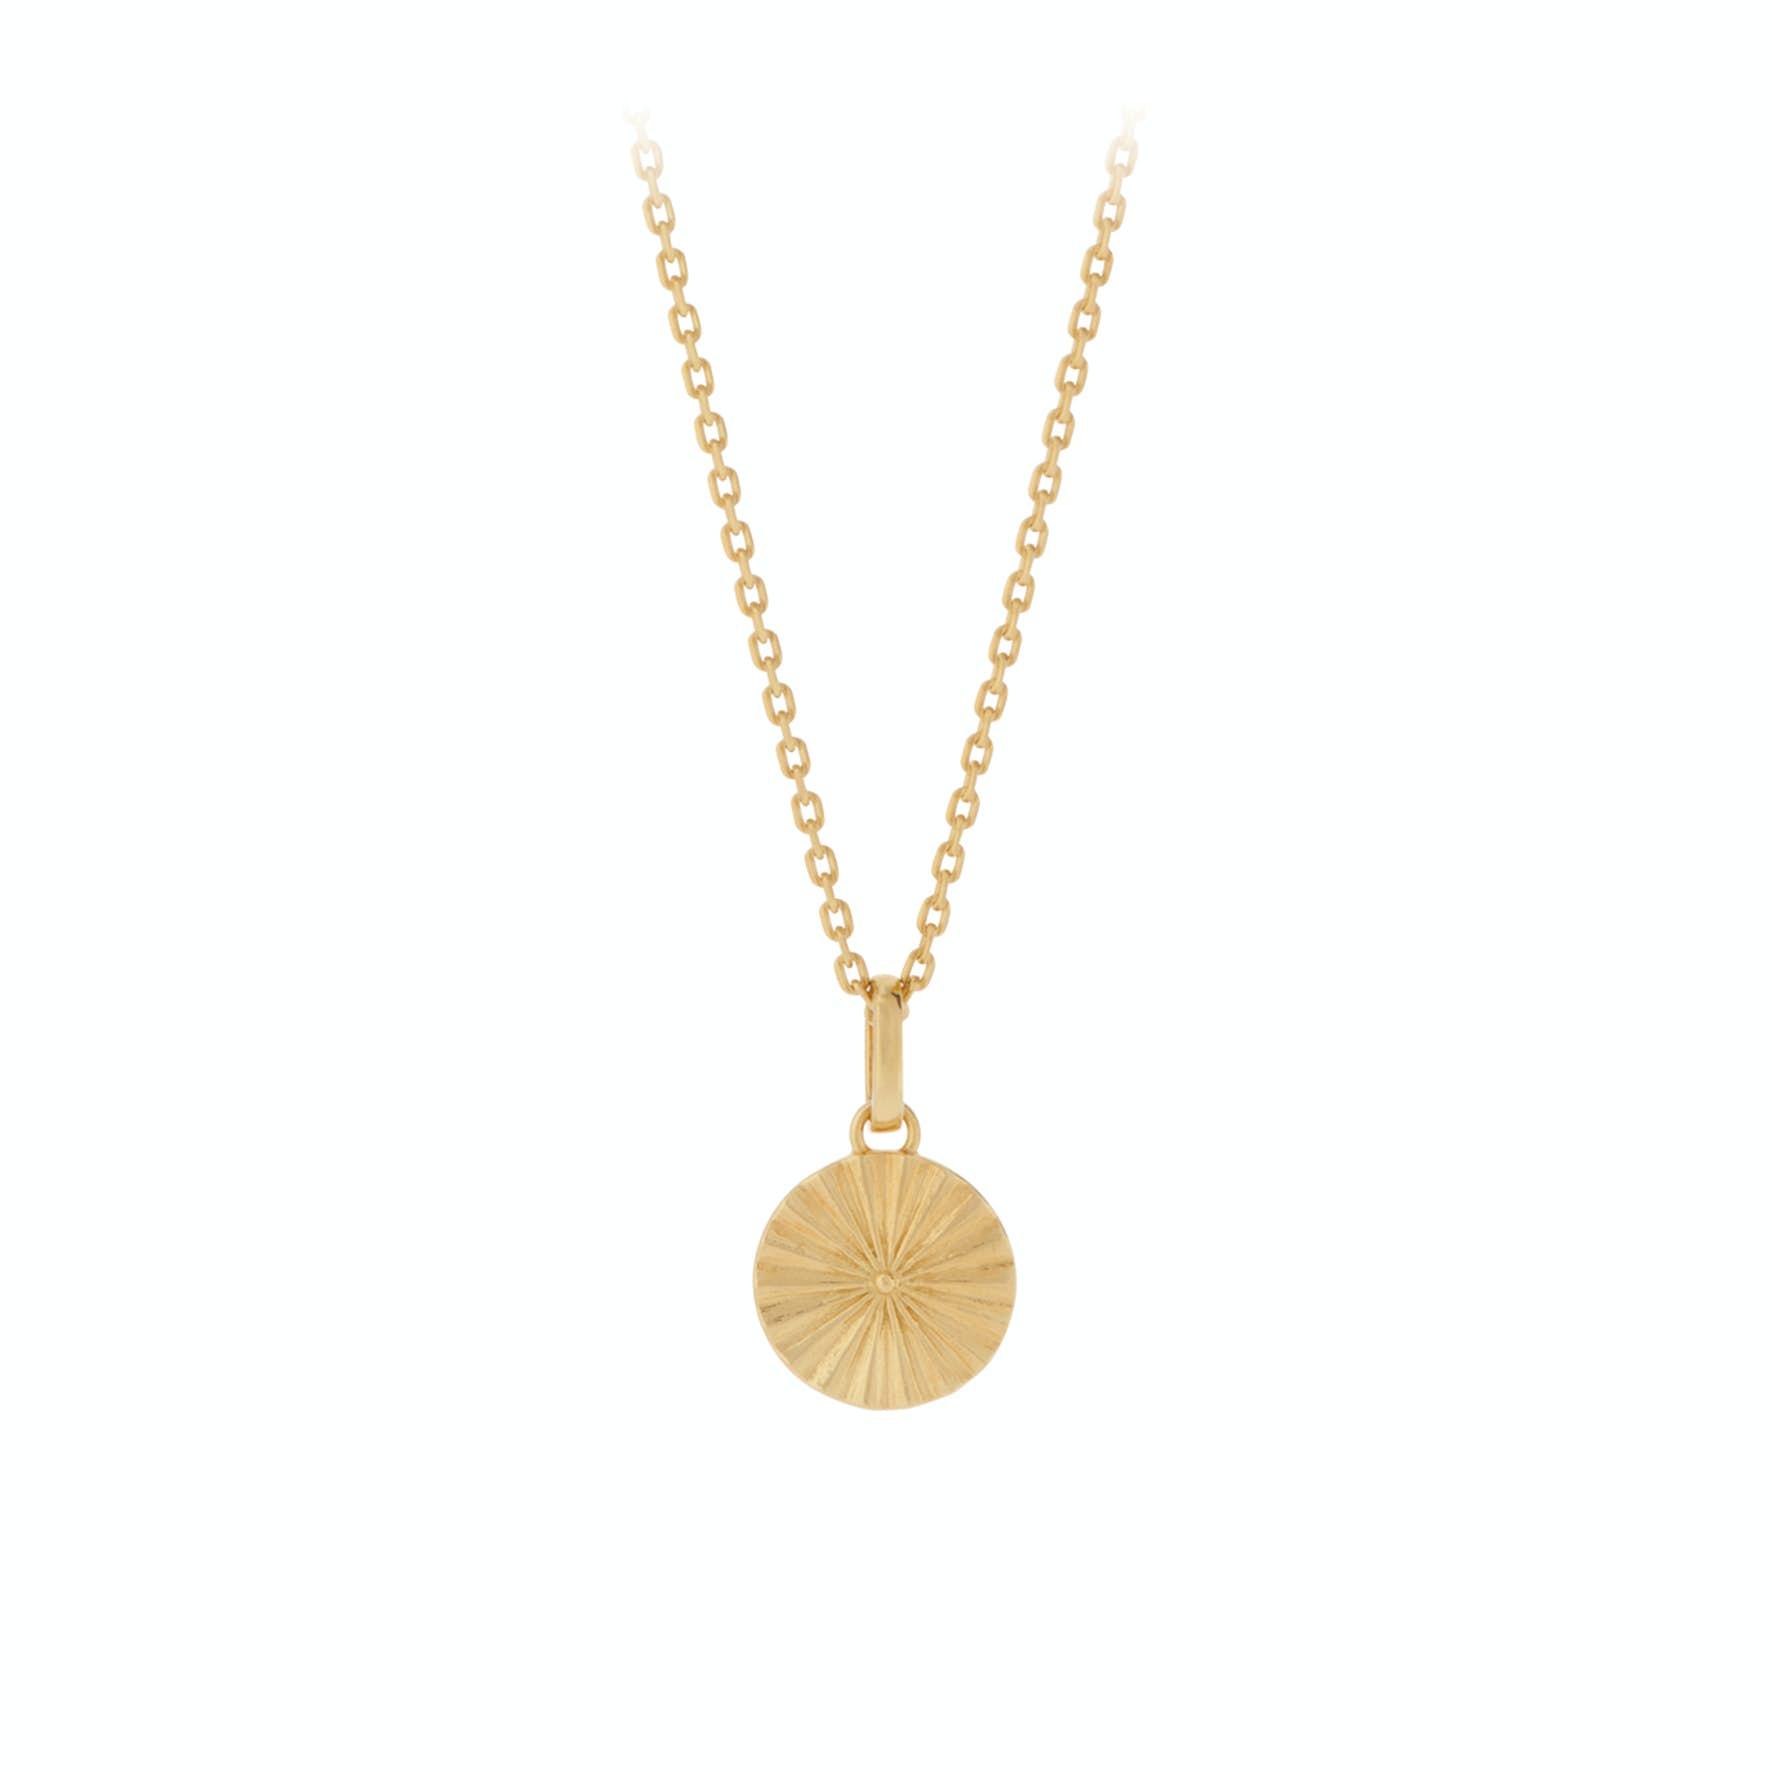 Sun Necklace von Pernille Corydon in Vergoldet-Silber Sterling 925|Blank